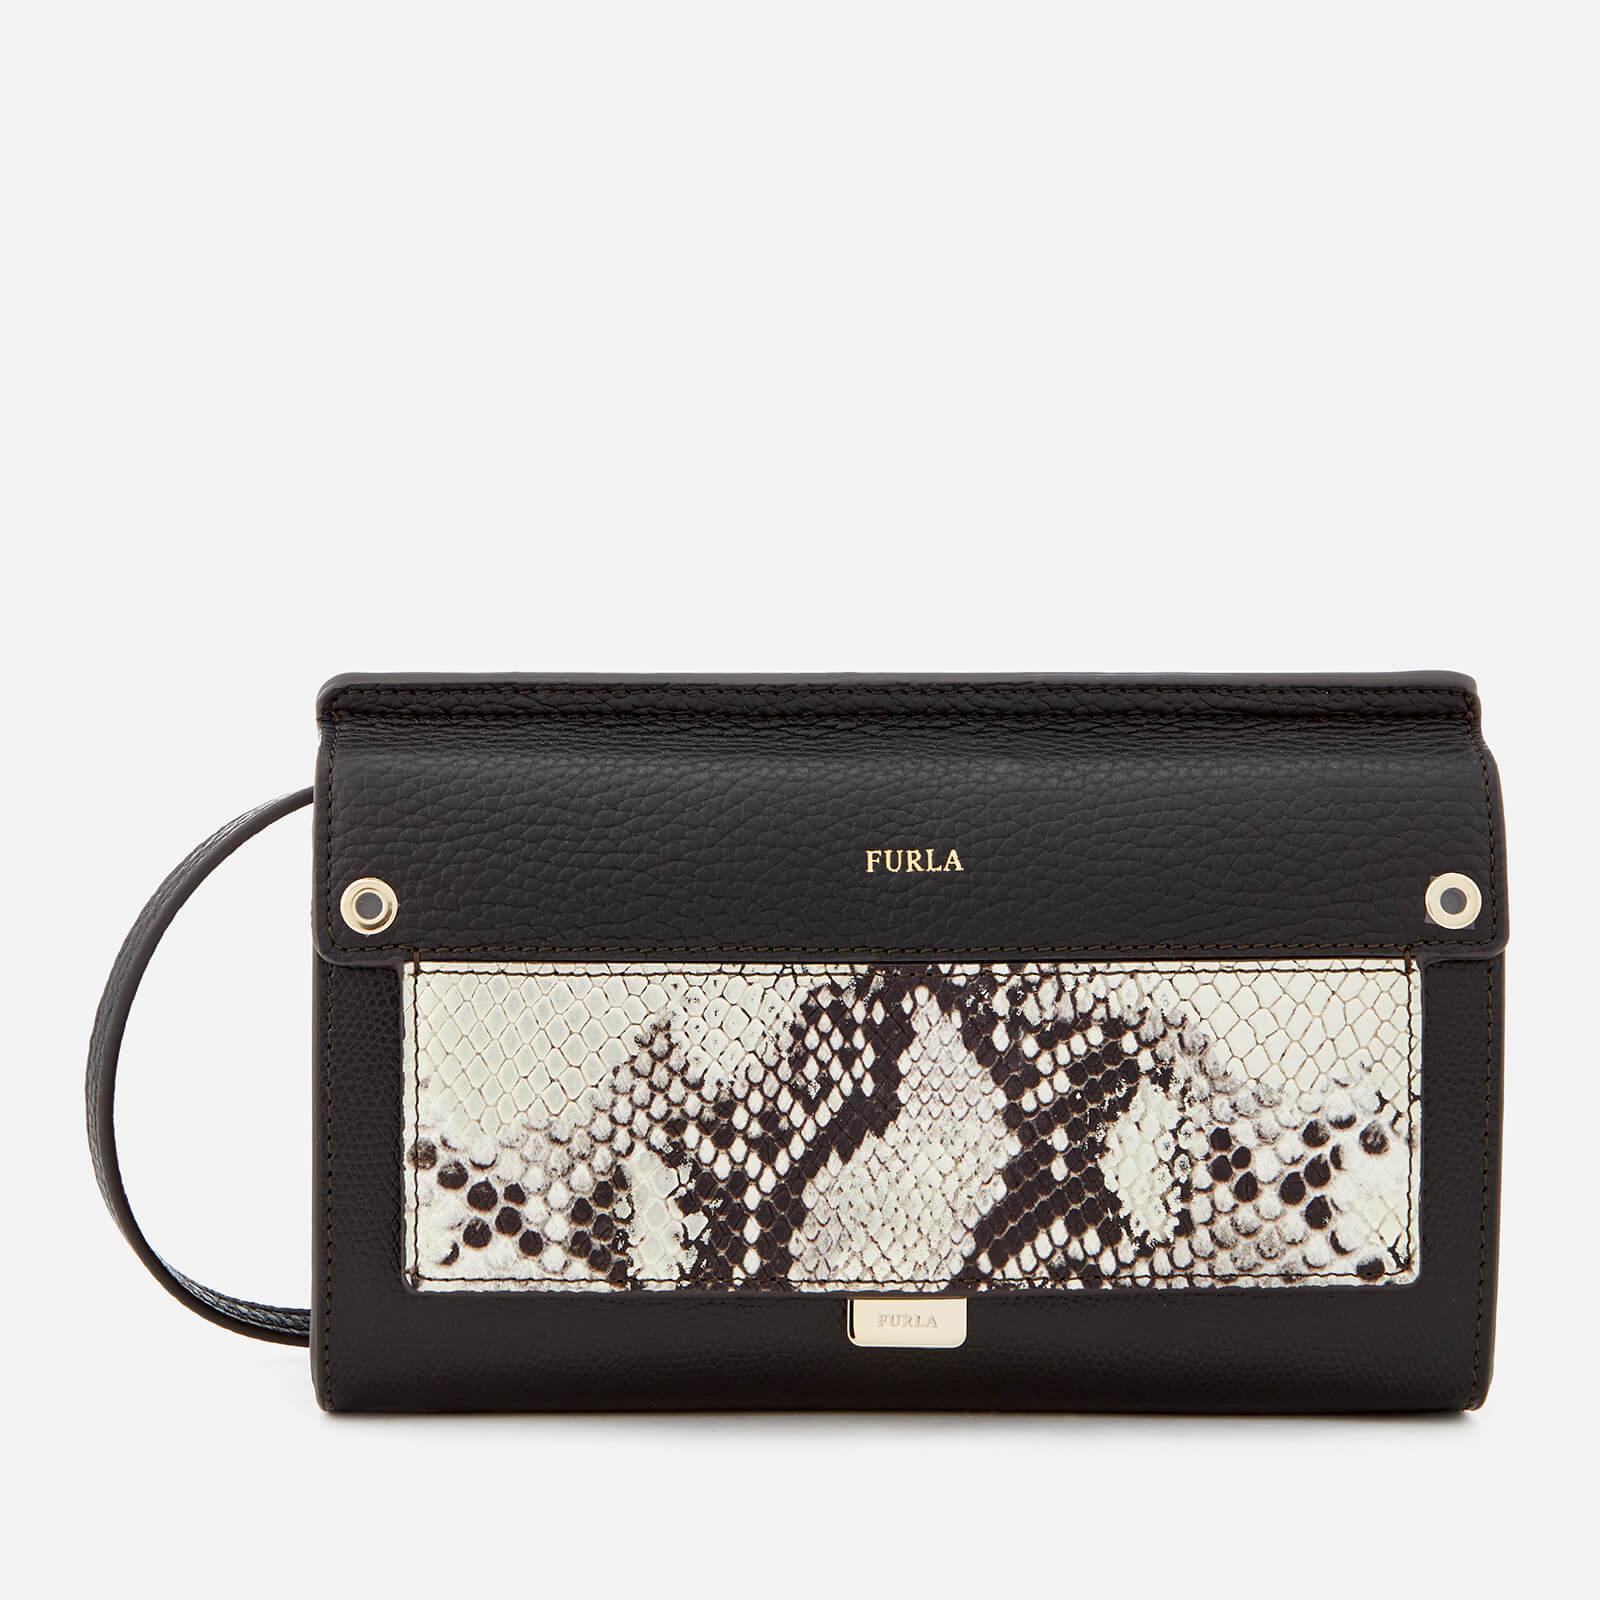 e584d8db54 Furla Women s Like Mini Cross Body Bag - Black Gold - Free UK Delivery over  £50